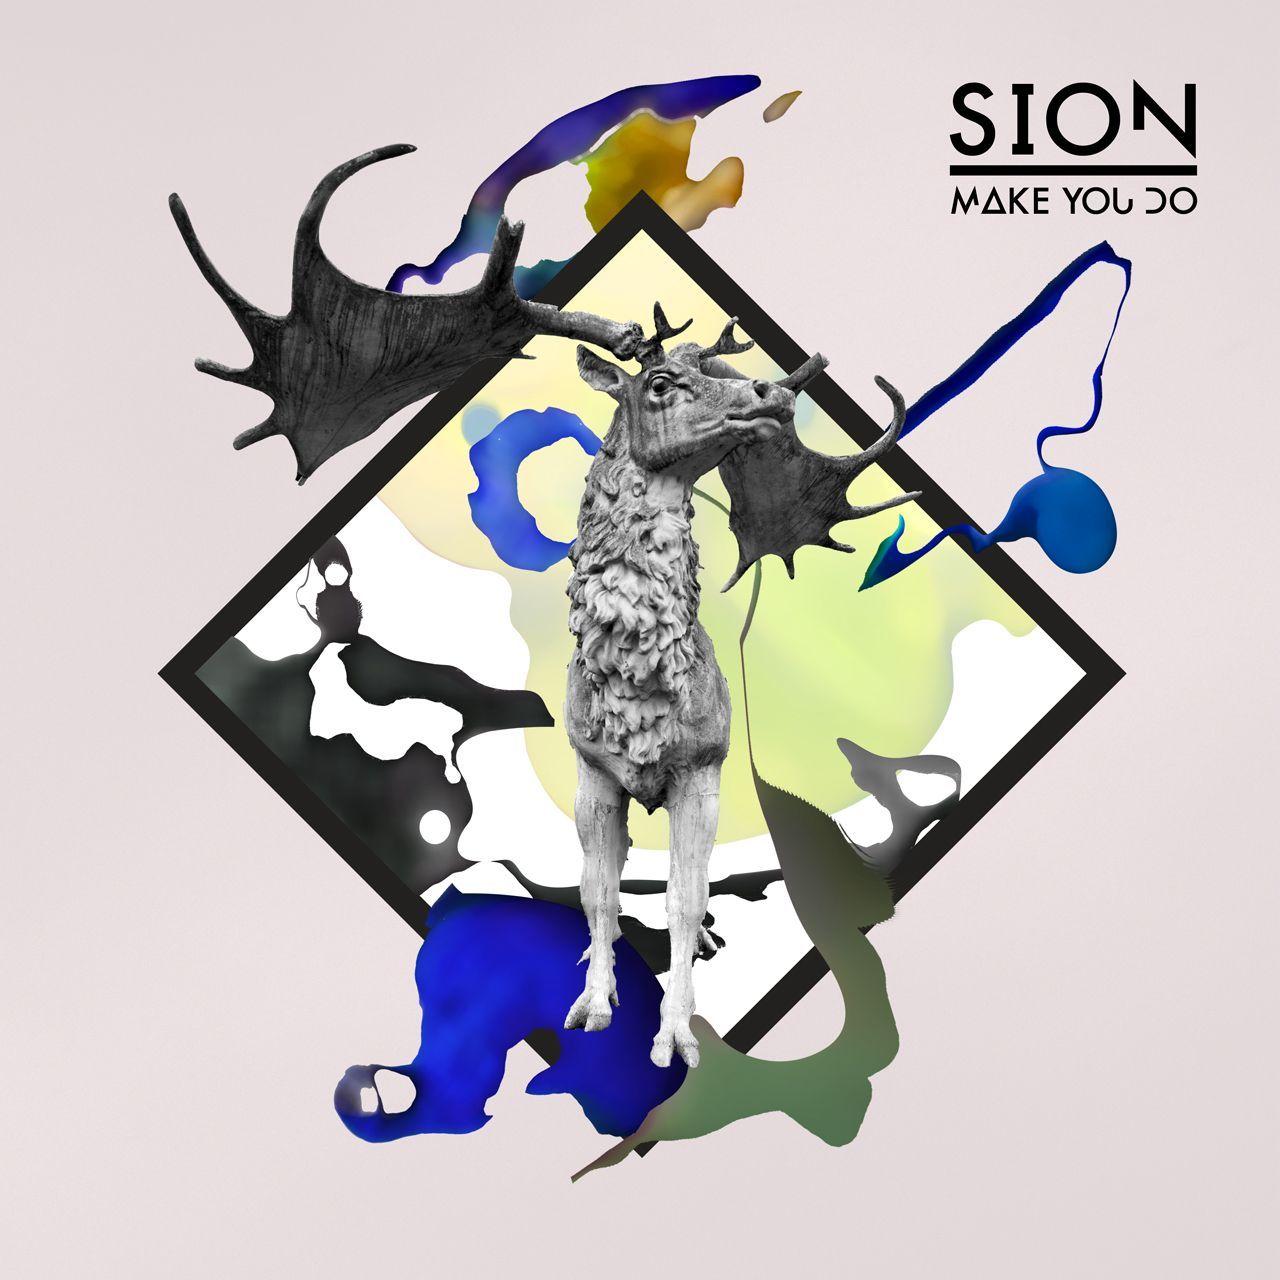 sion-makeyoudo-art.jpg.jpeg